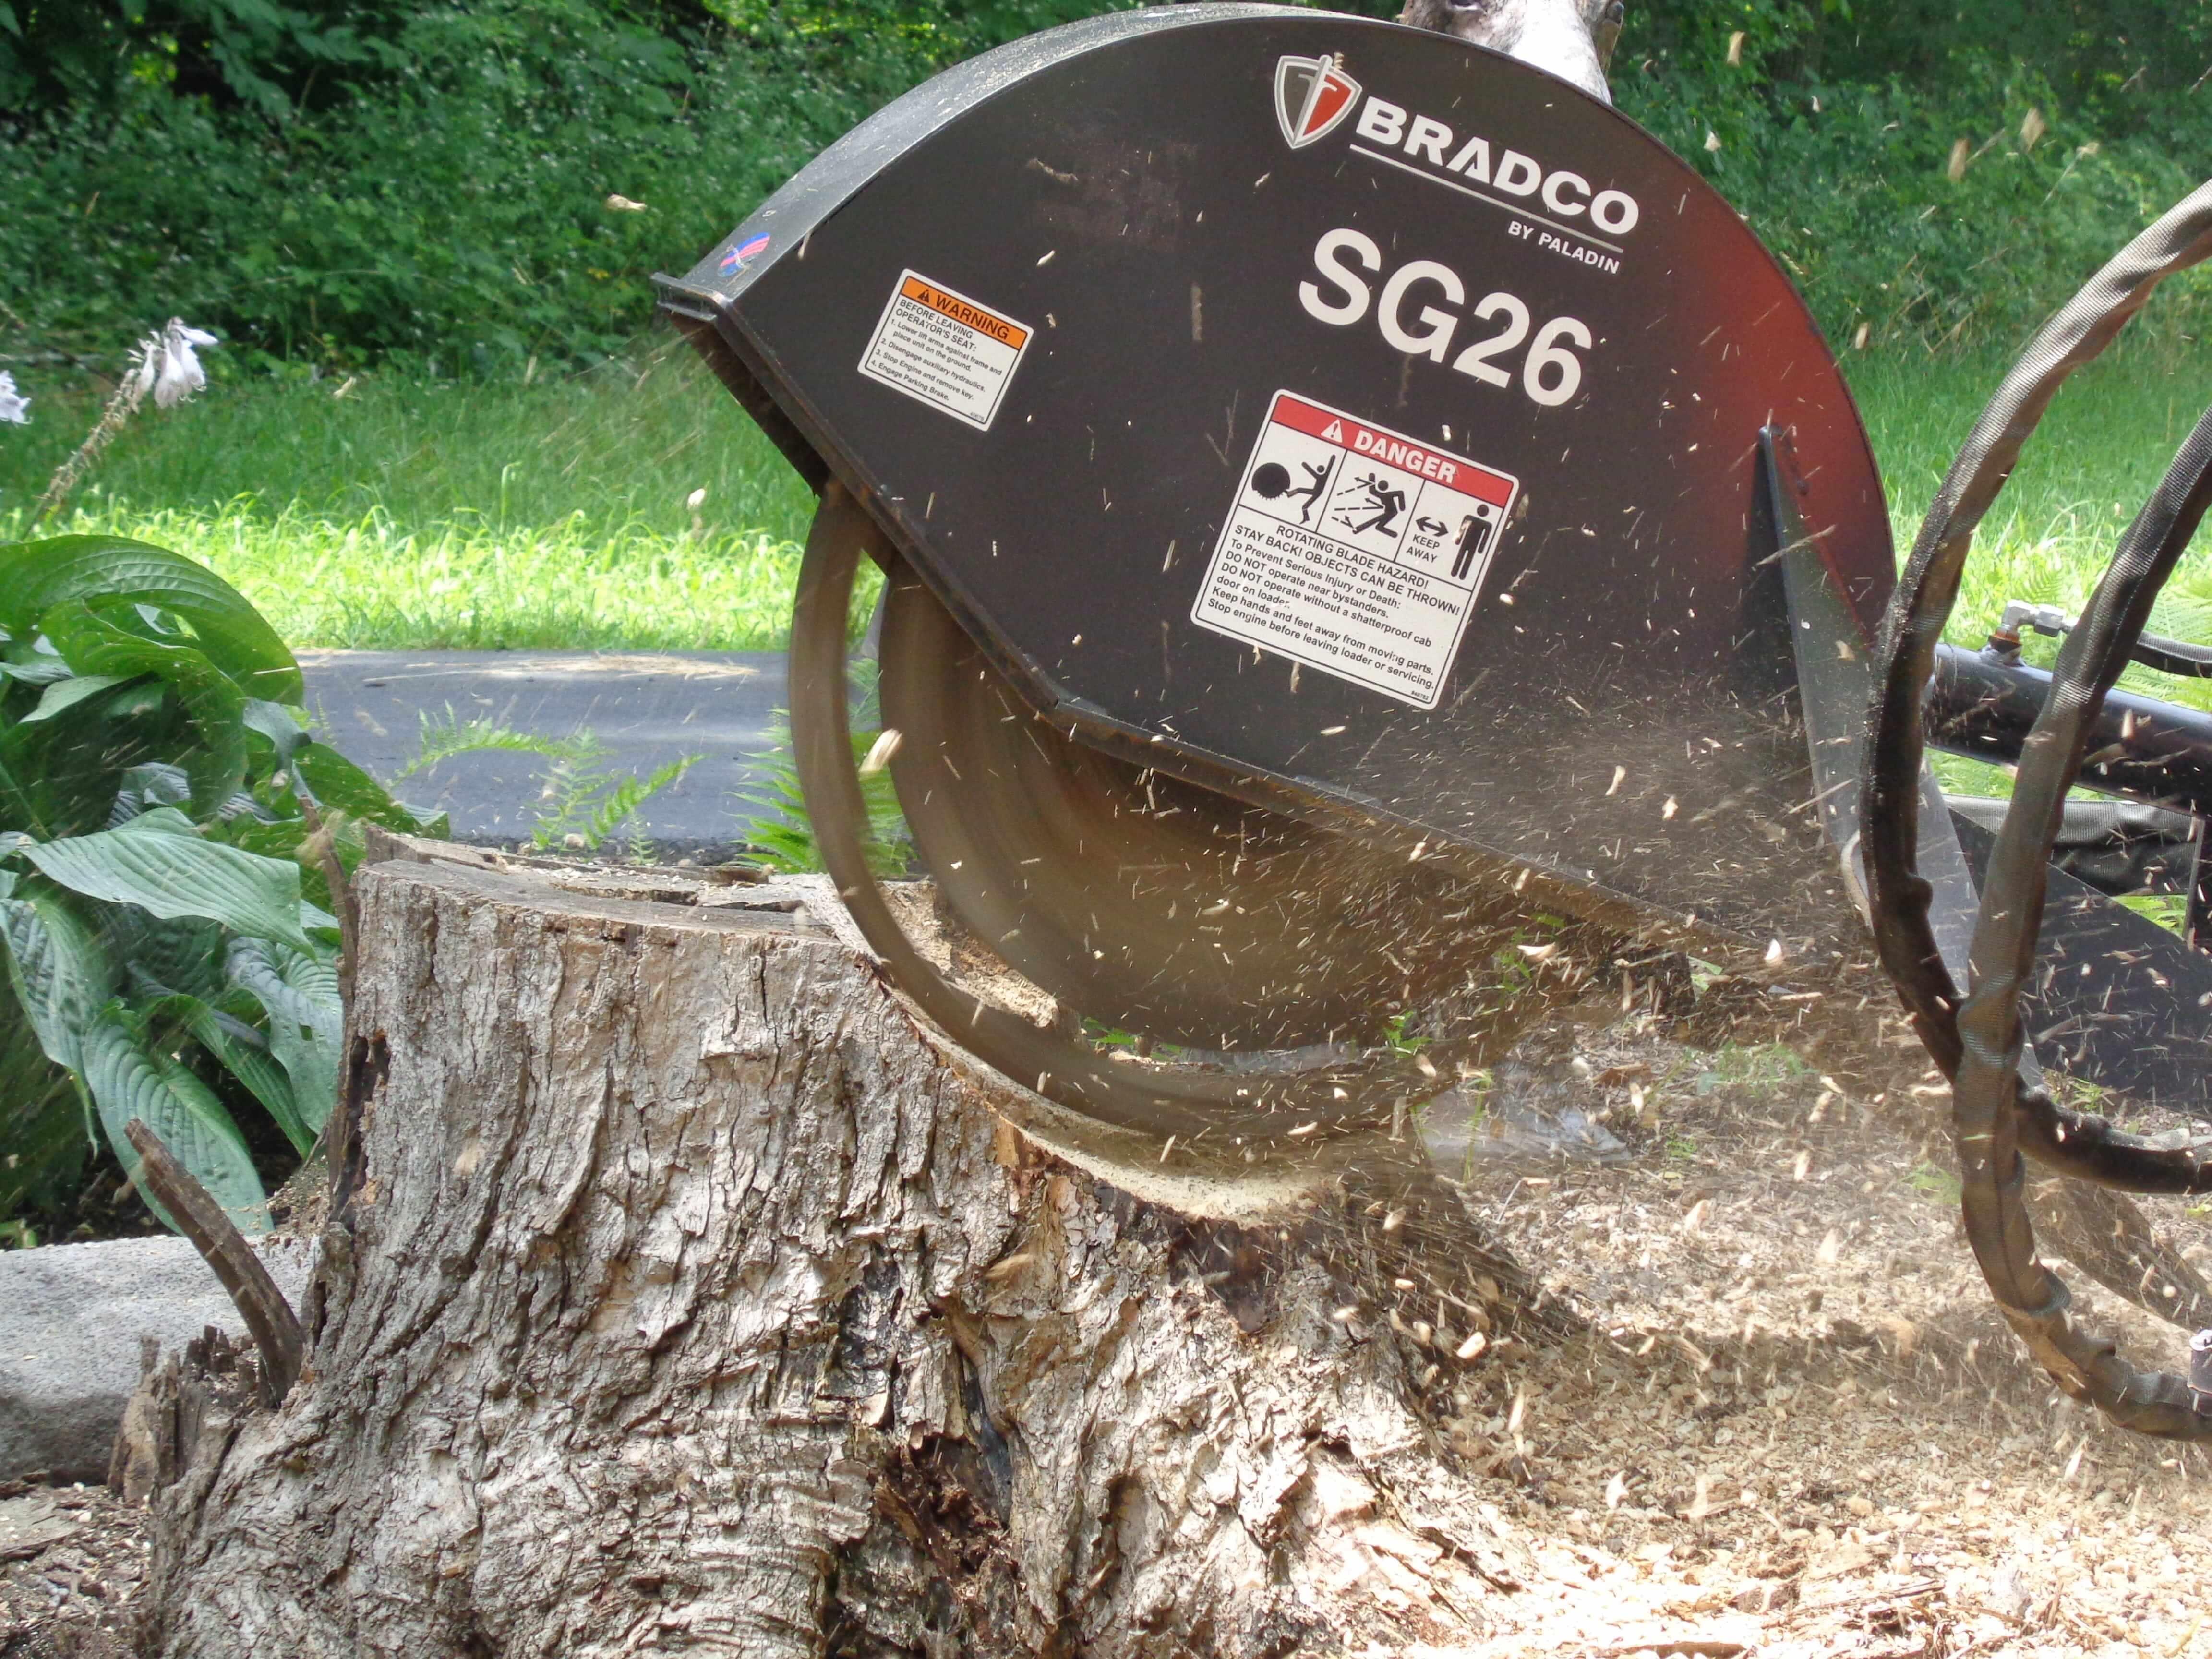 Bradco 26 Sg26 Skid Steer Stump Grinder Attachment Lano Equipment